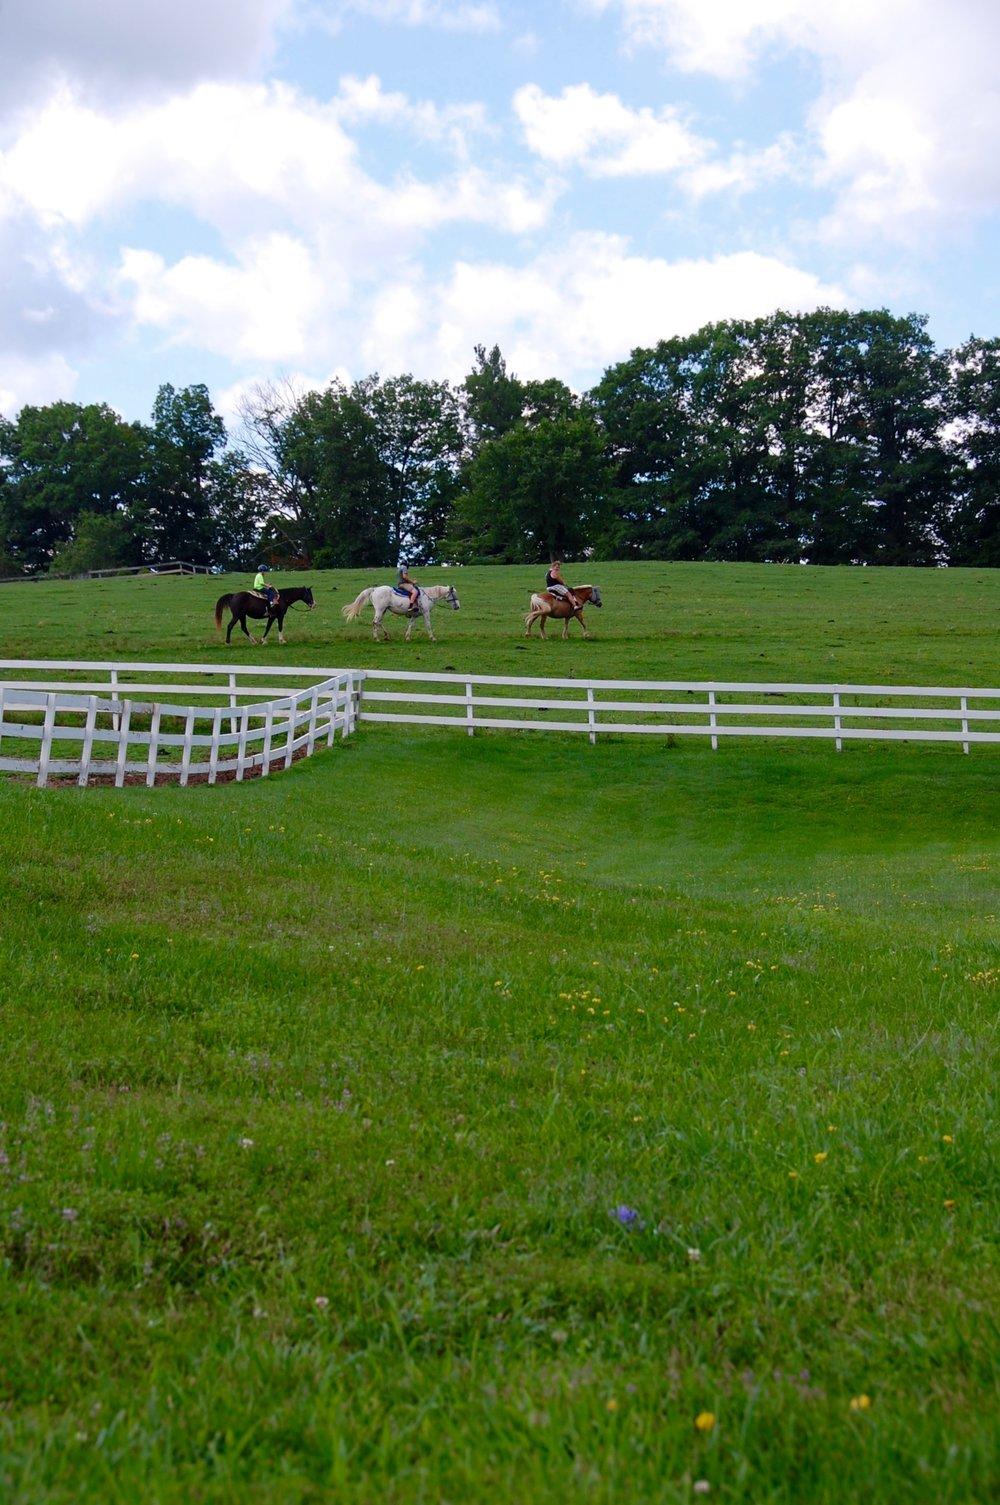 east durham horseback riding  east durham horseback riding